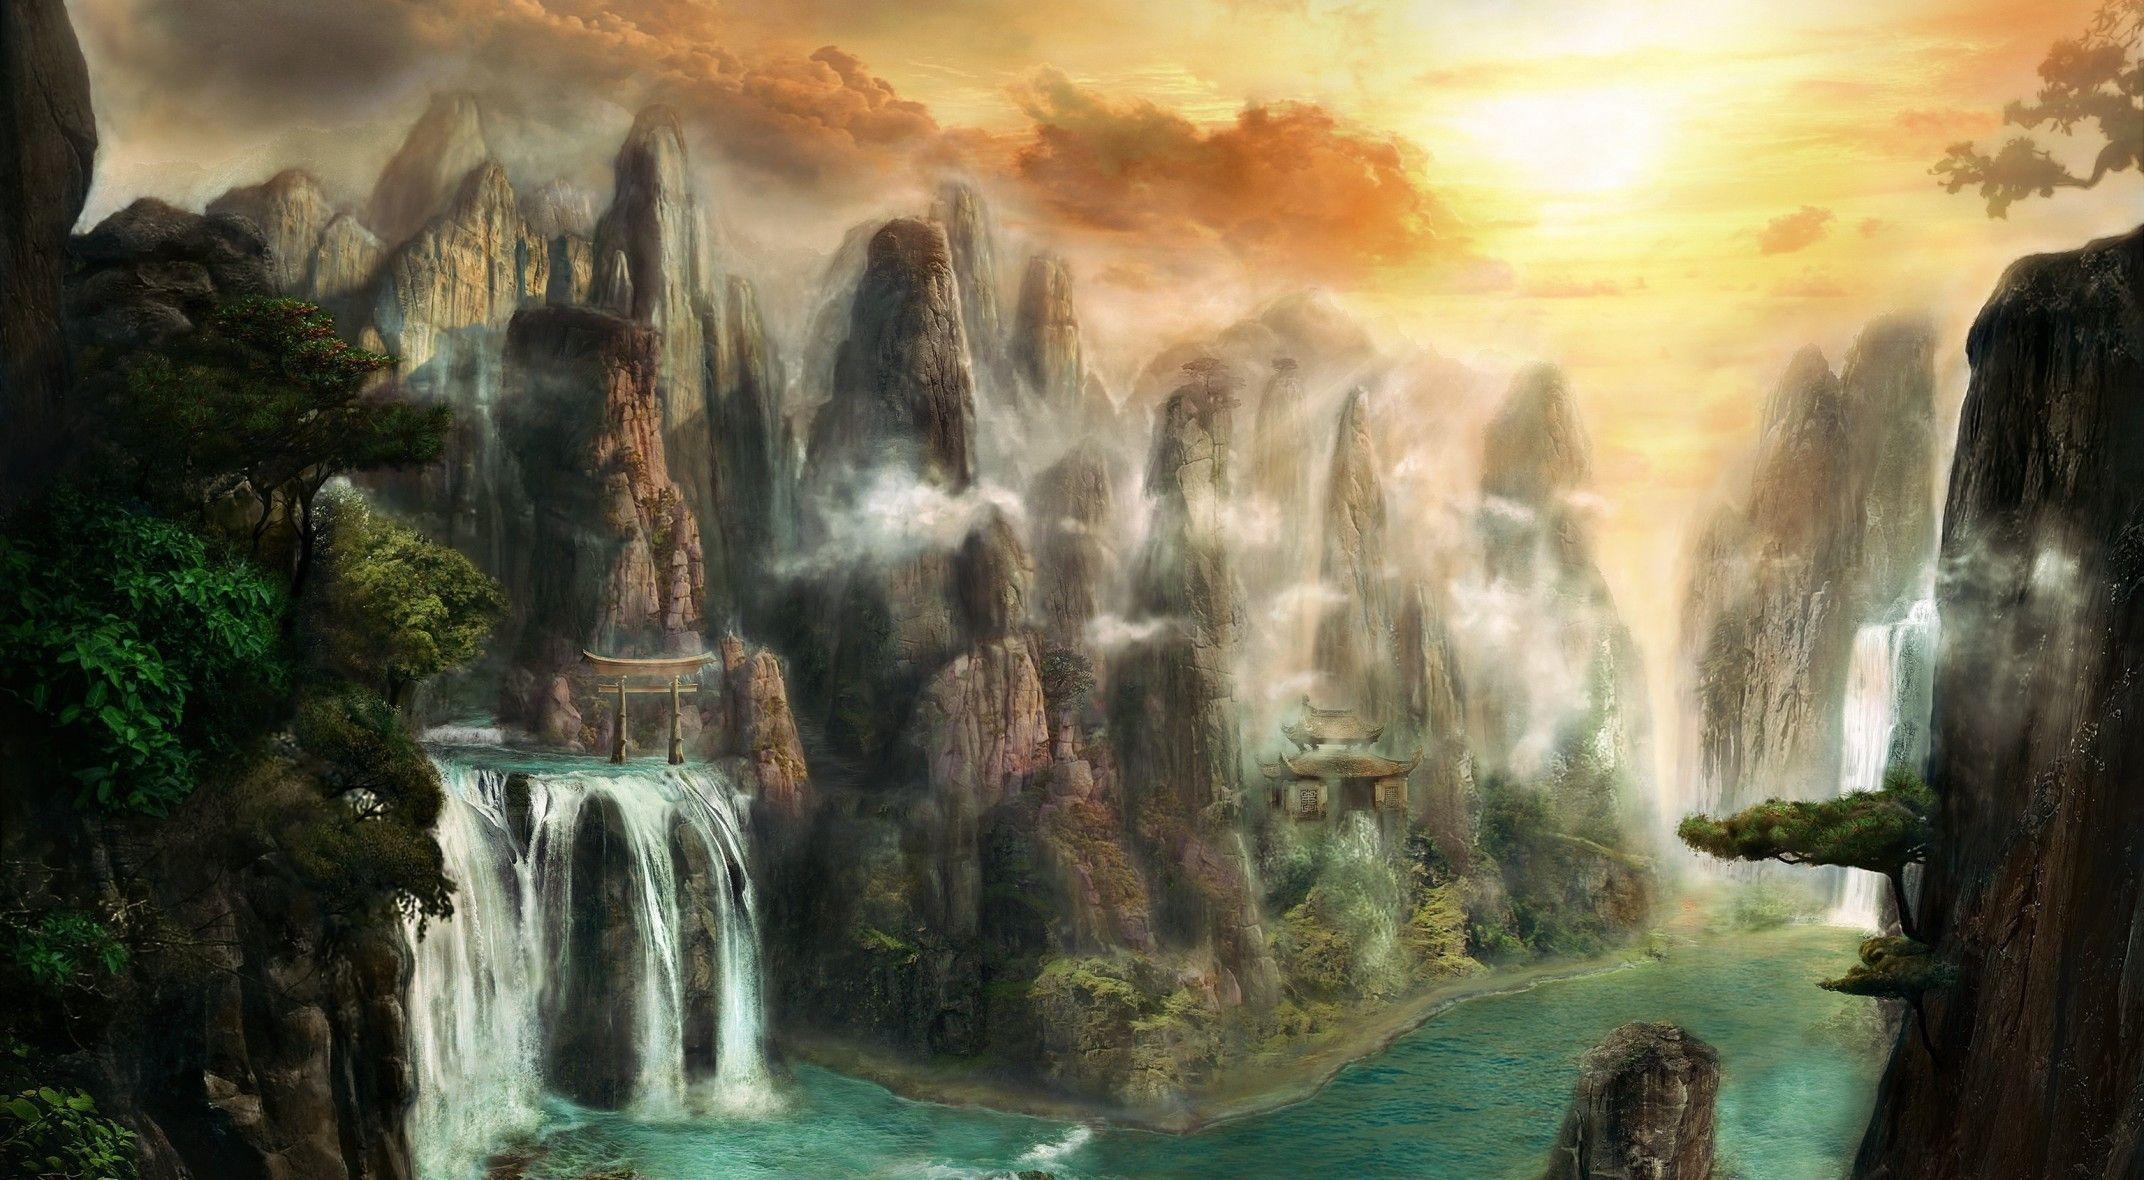 Fantasy Landscape Wallpapers Hd Free Dowwnload Fantasy Landscape Digital Art Fantasy Landscape Wallpaper